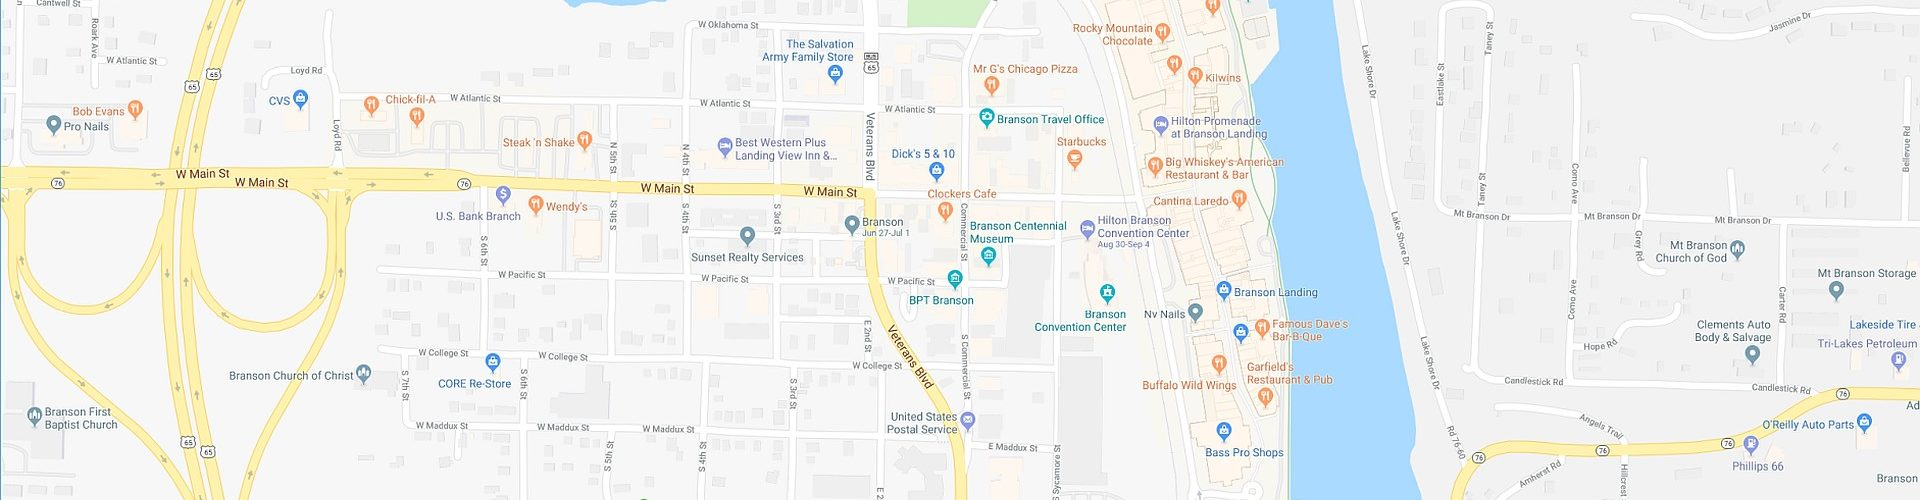 Free Branson 2020 Map Travel